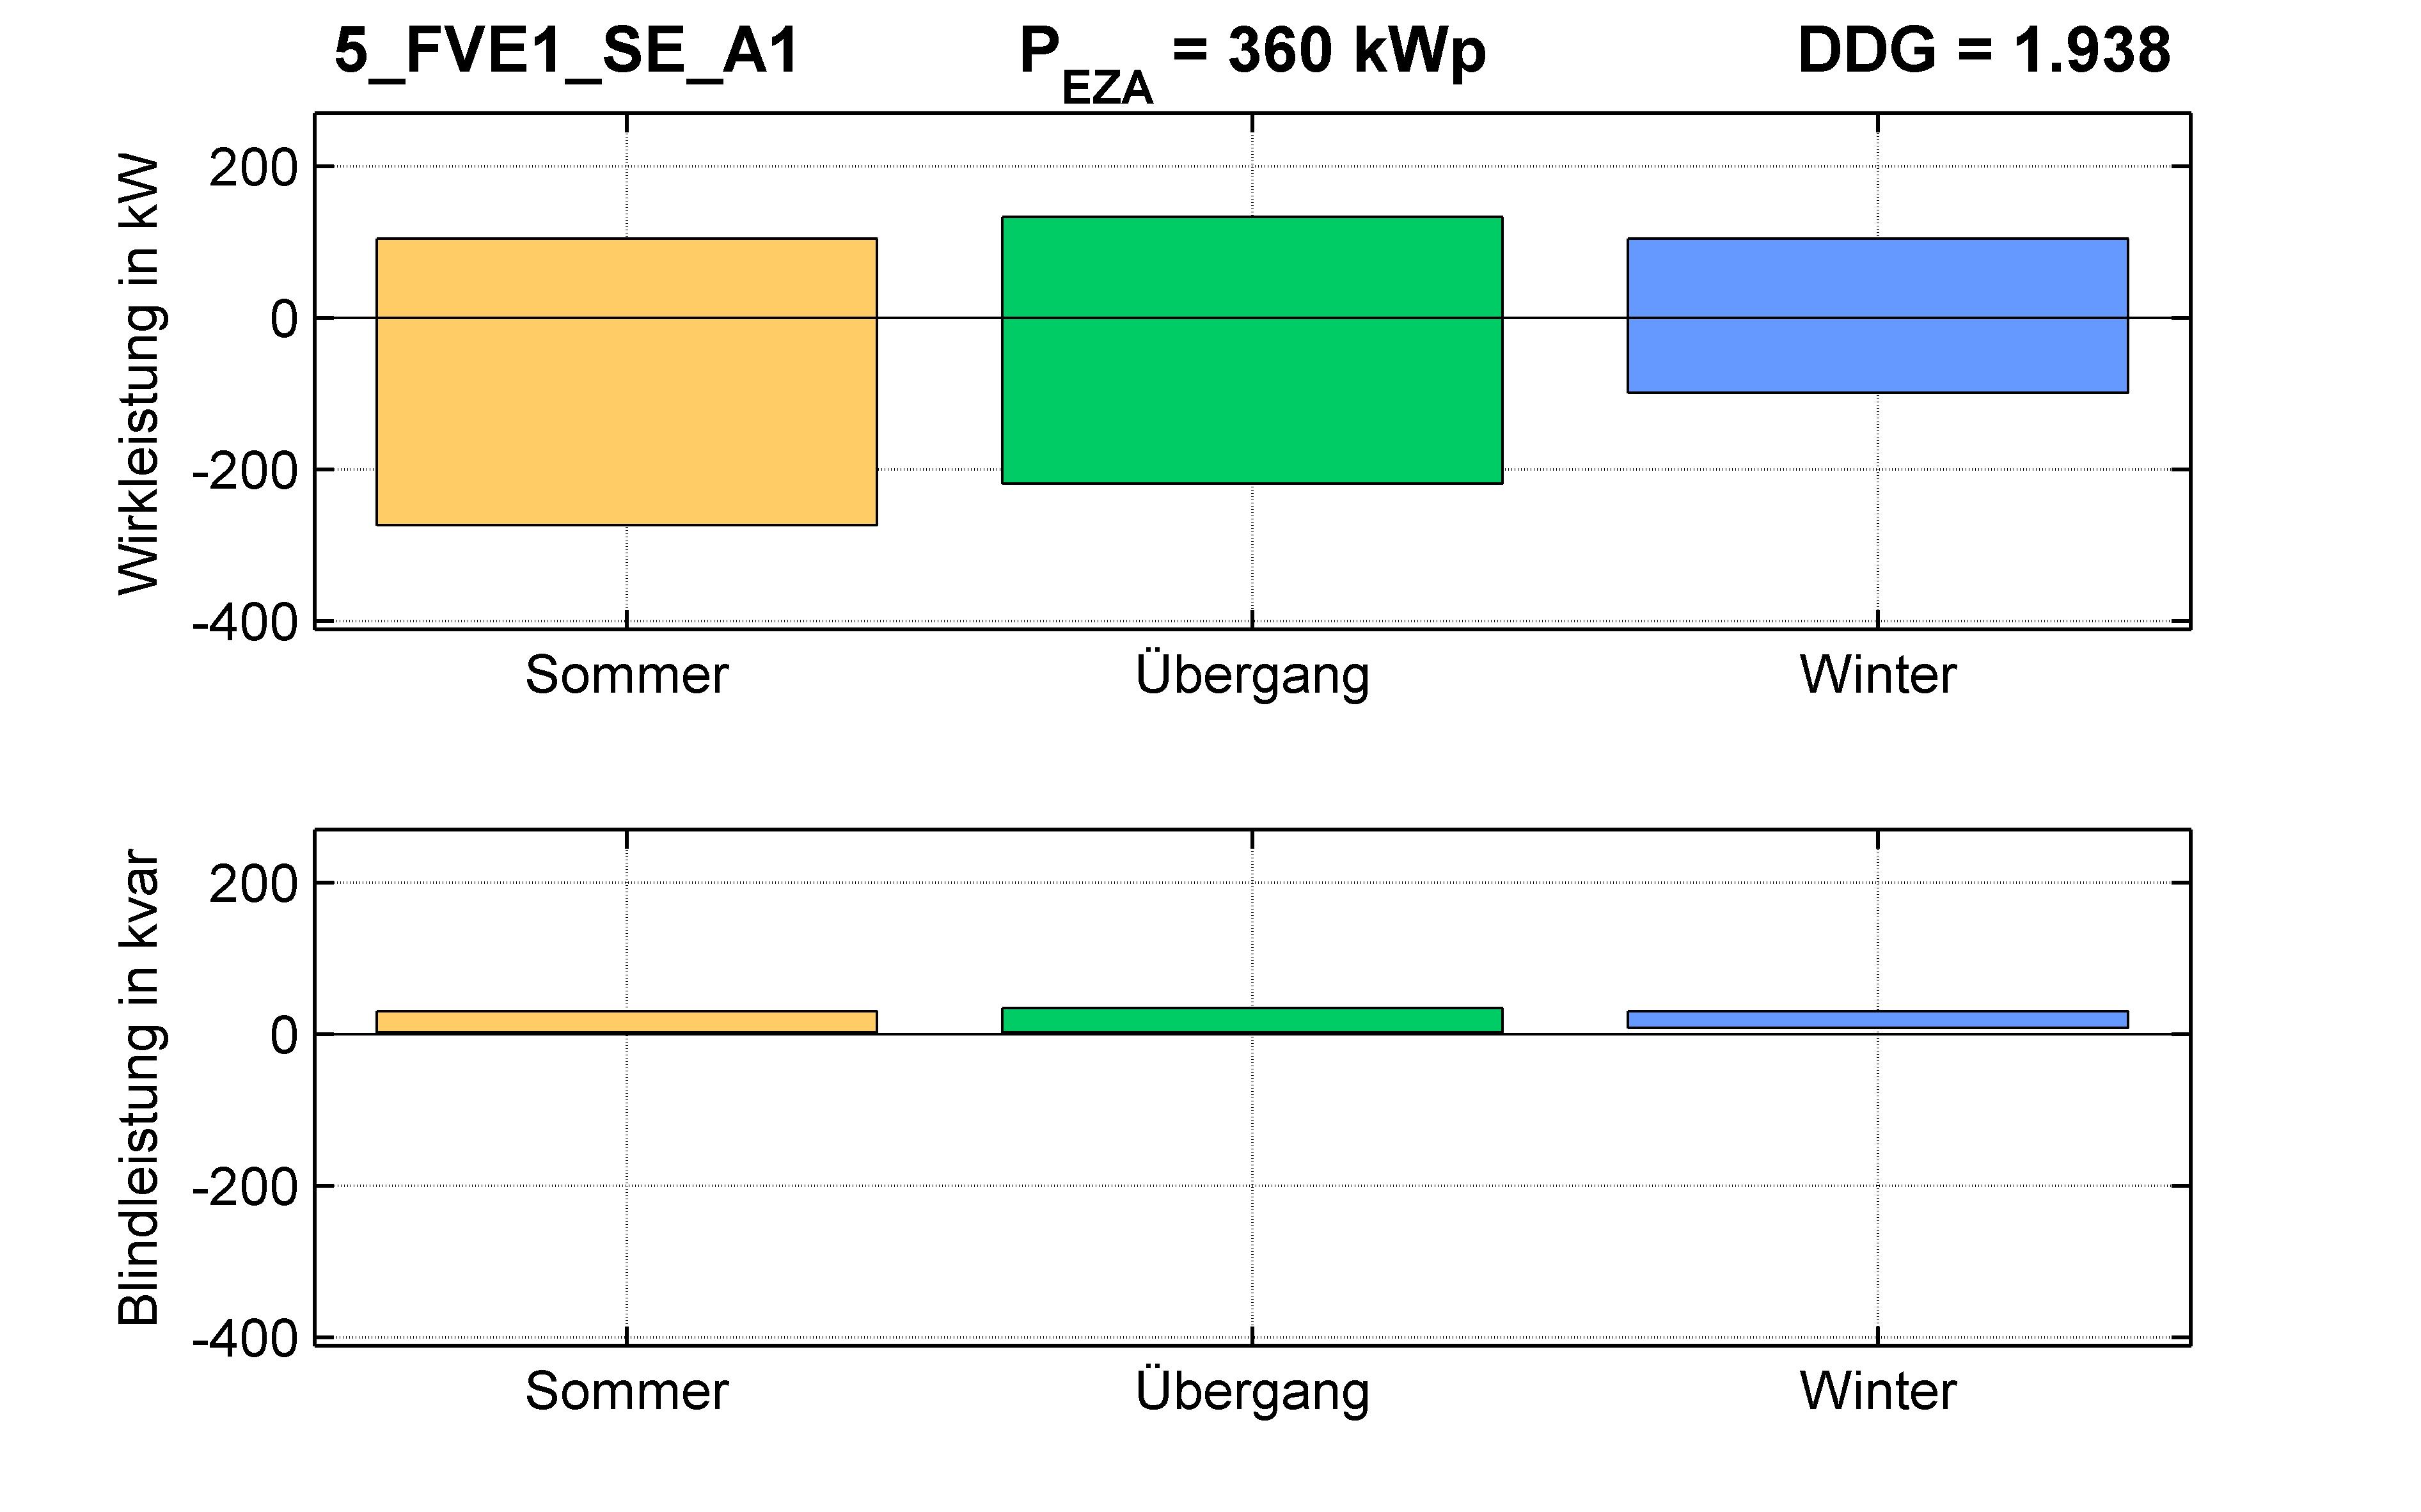 FVE1 | STATION (SE) A1 | PQ-Bilanz